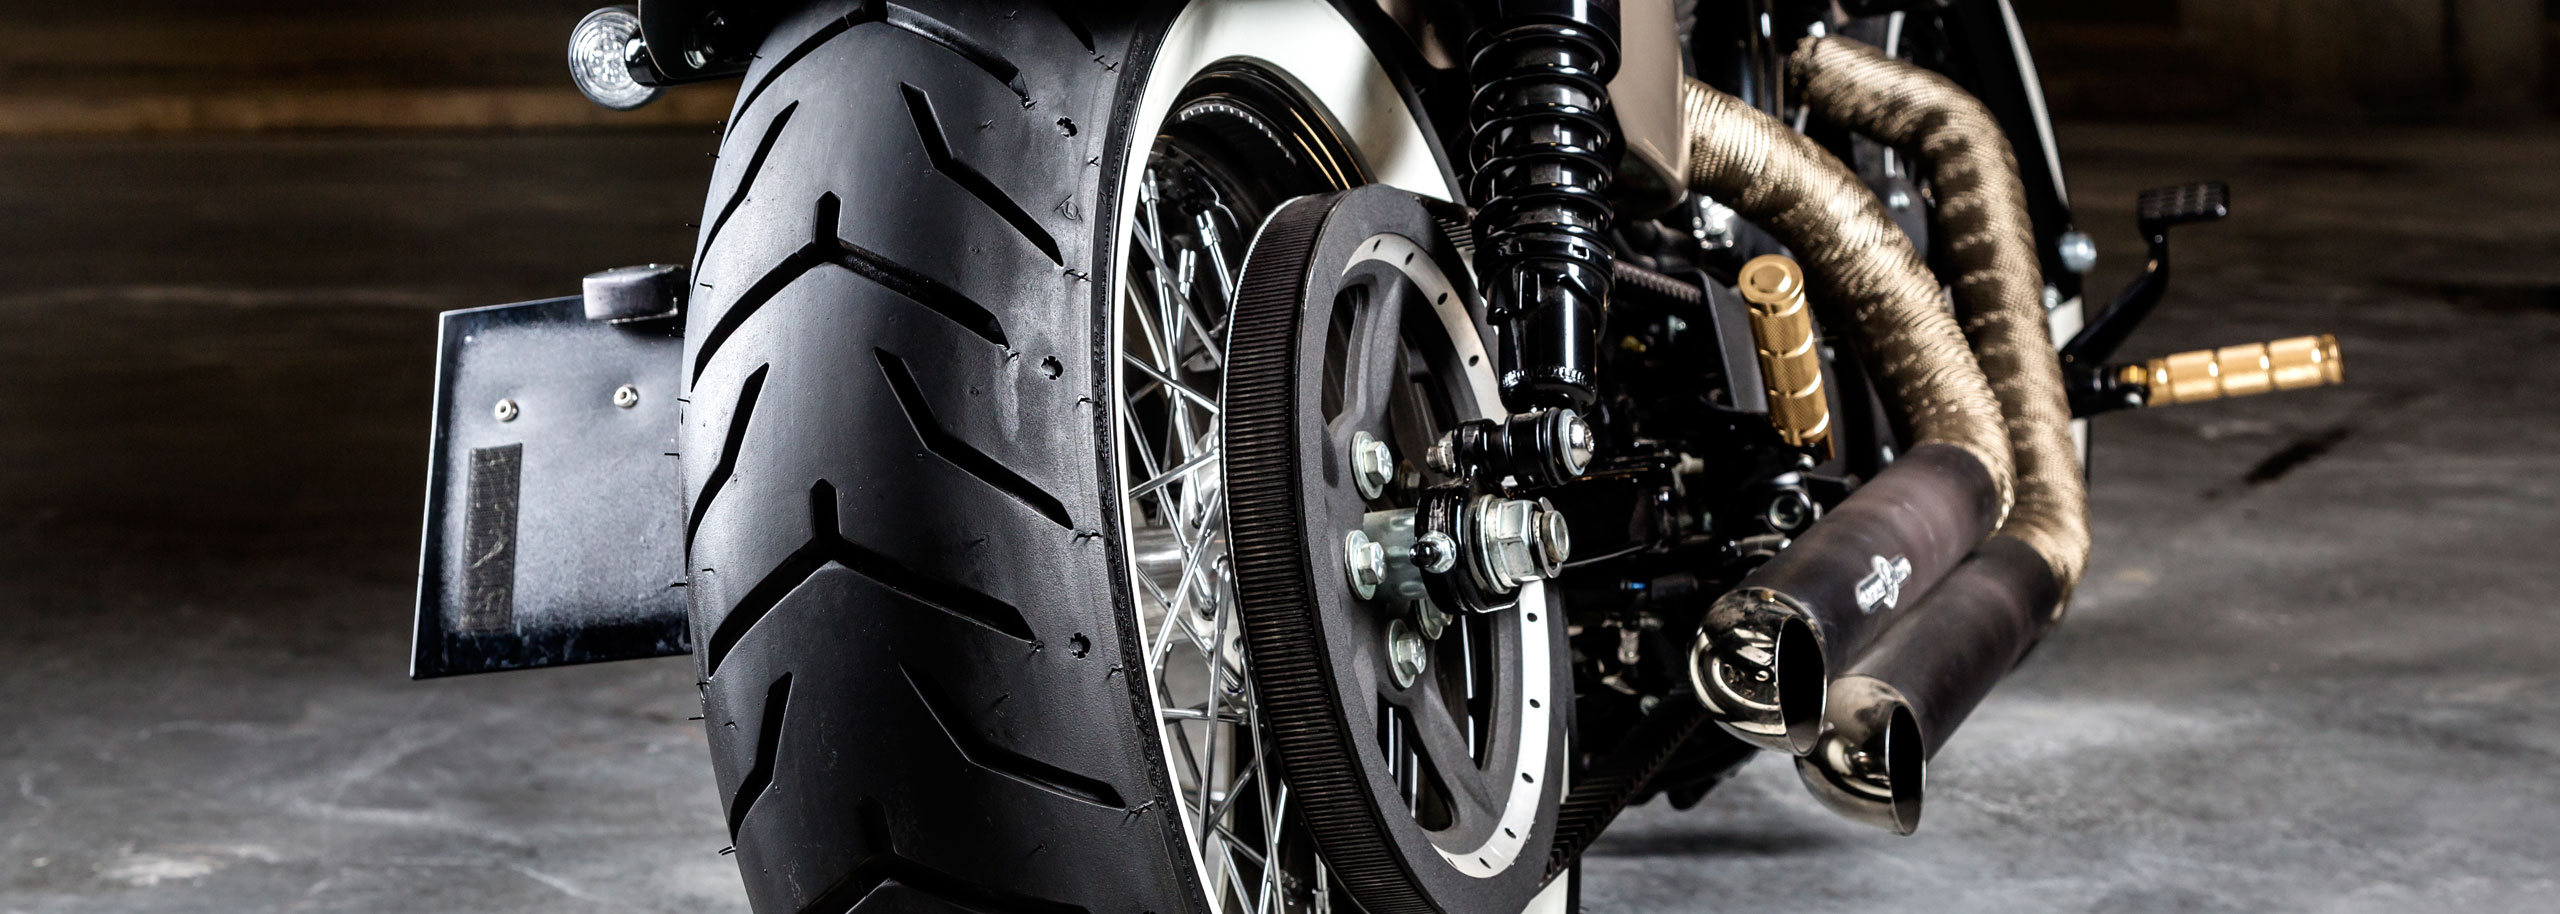 03_TITAN-Harley-Davidson-Umbau-Sportster-48-Cafe-Racer-Graz-Motorrad-Umbau-Austria-Vintage_Custom-Bikes_Motorrad-Umbauten